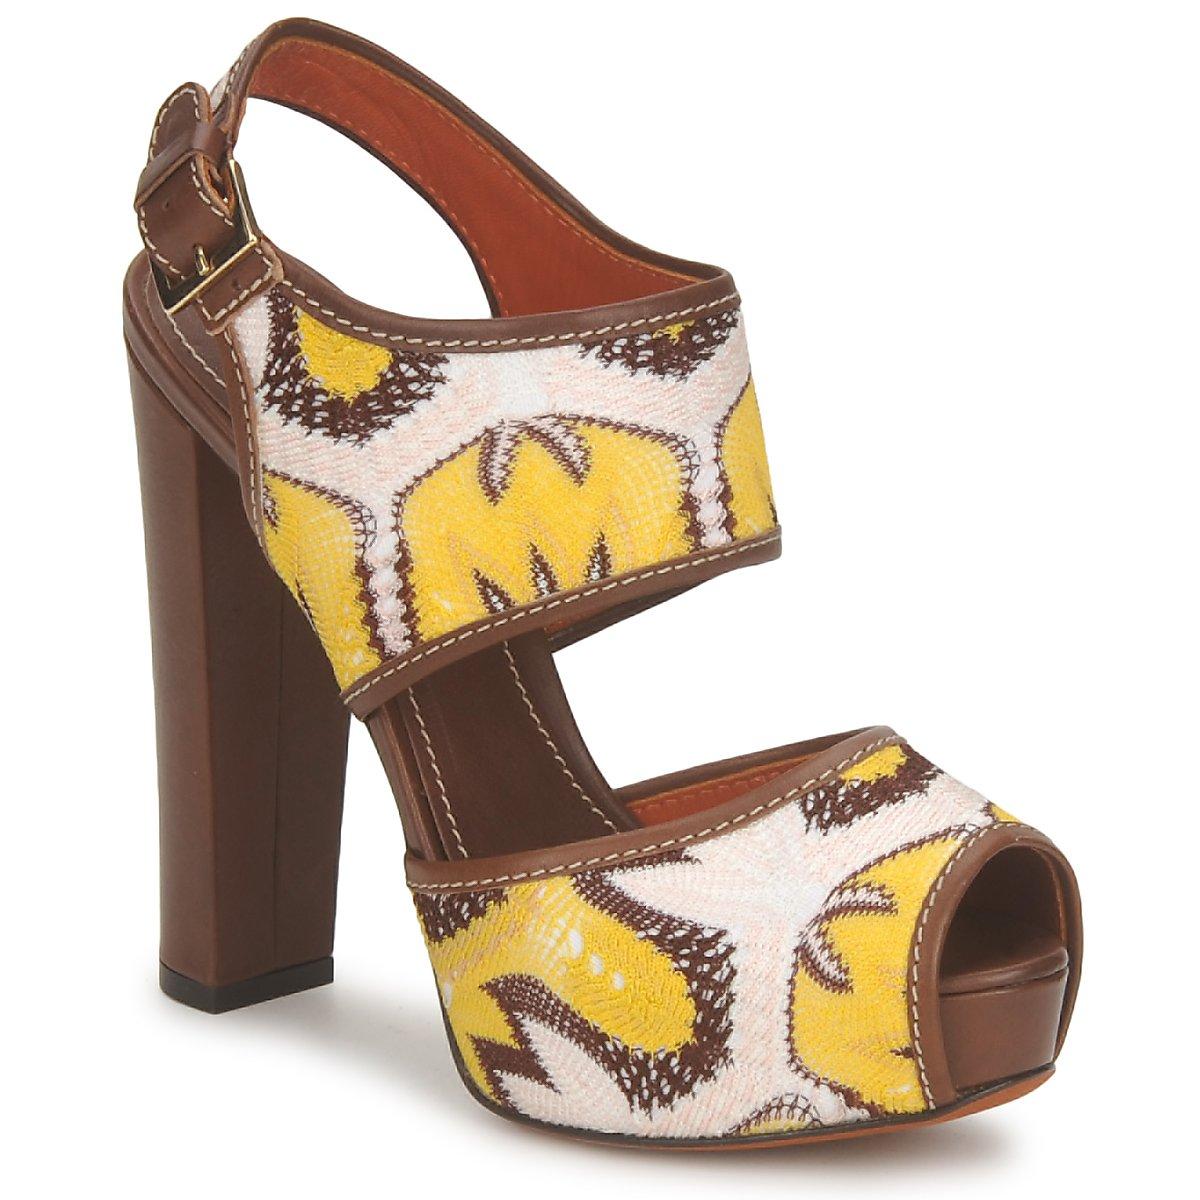 Sandale Missoni TM81 Marron / Beige / Jaune